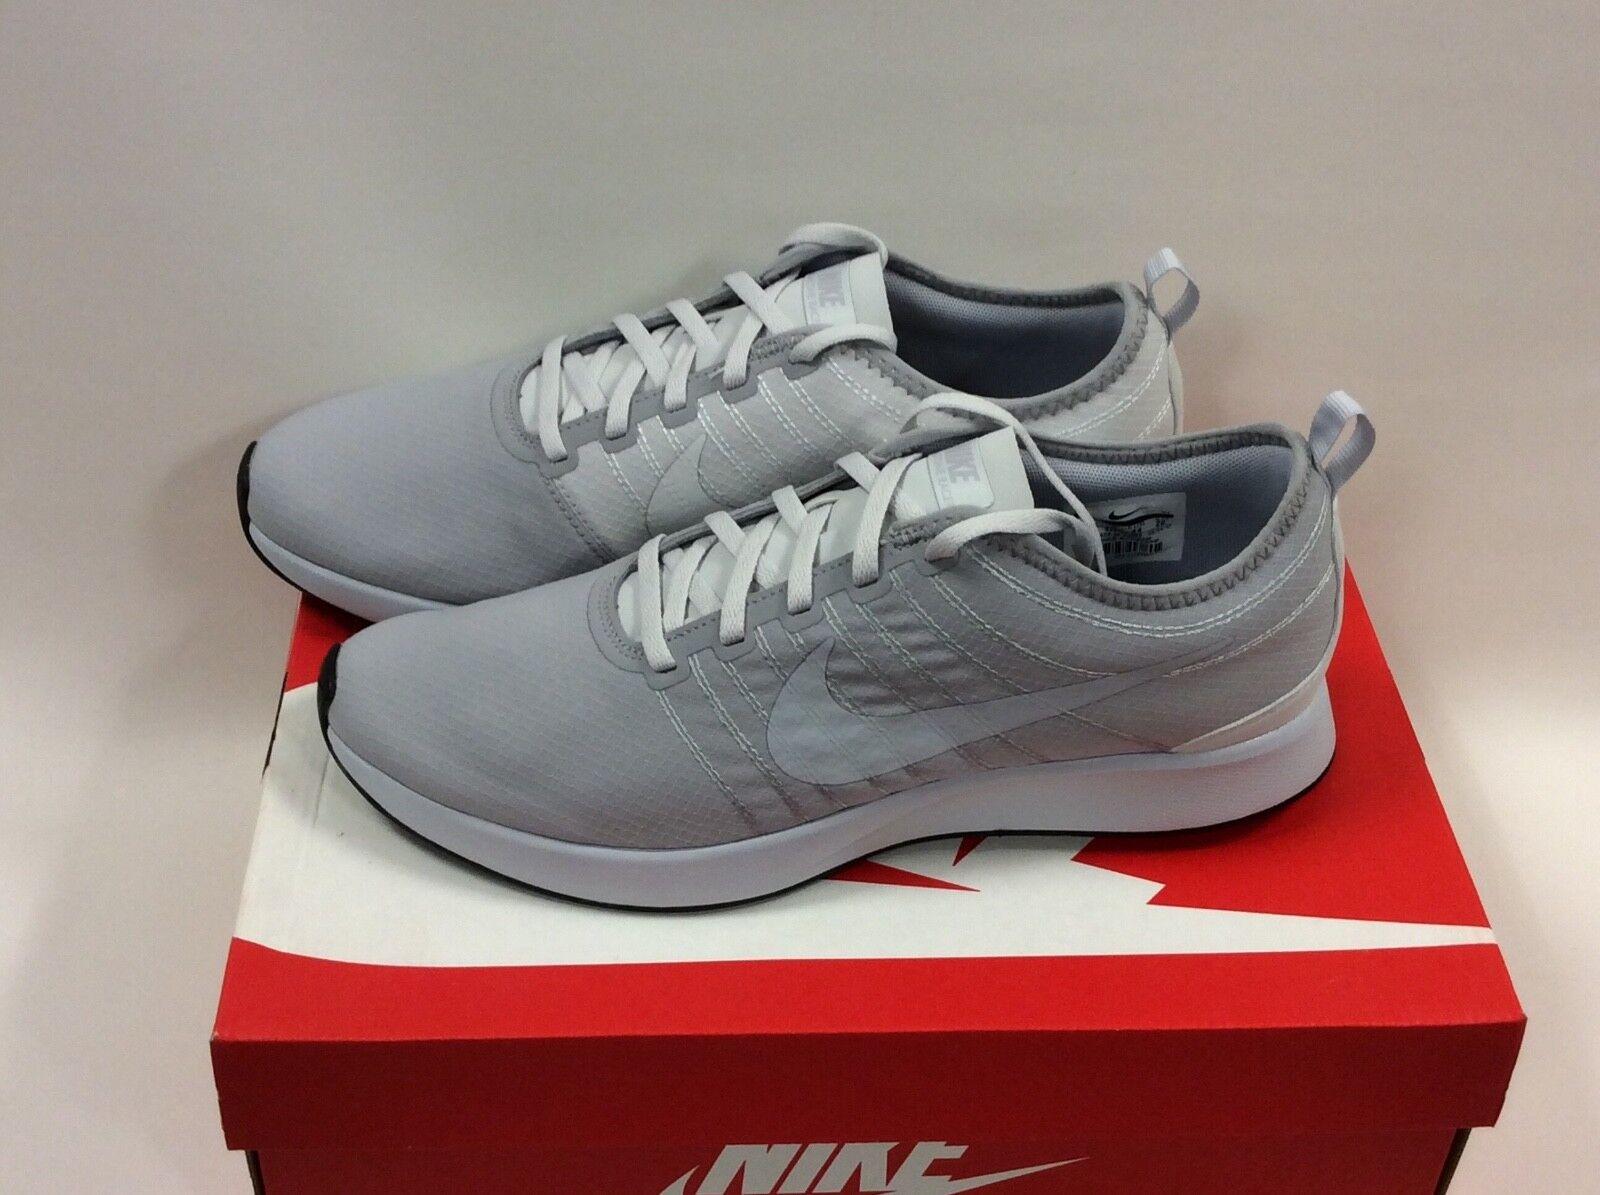 Nike Dualtone Racer Se Mens Running Trainers  Sneakers shoes UK 9